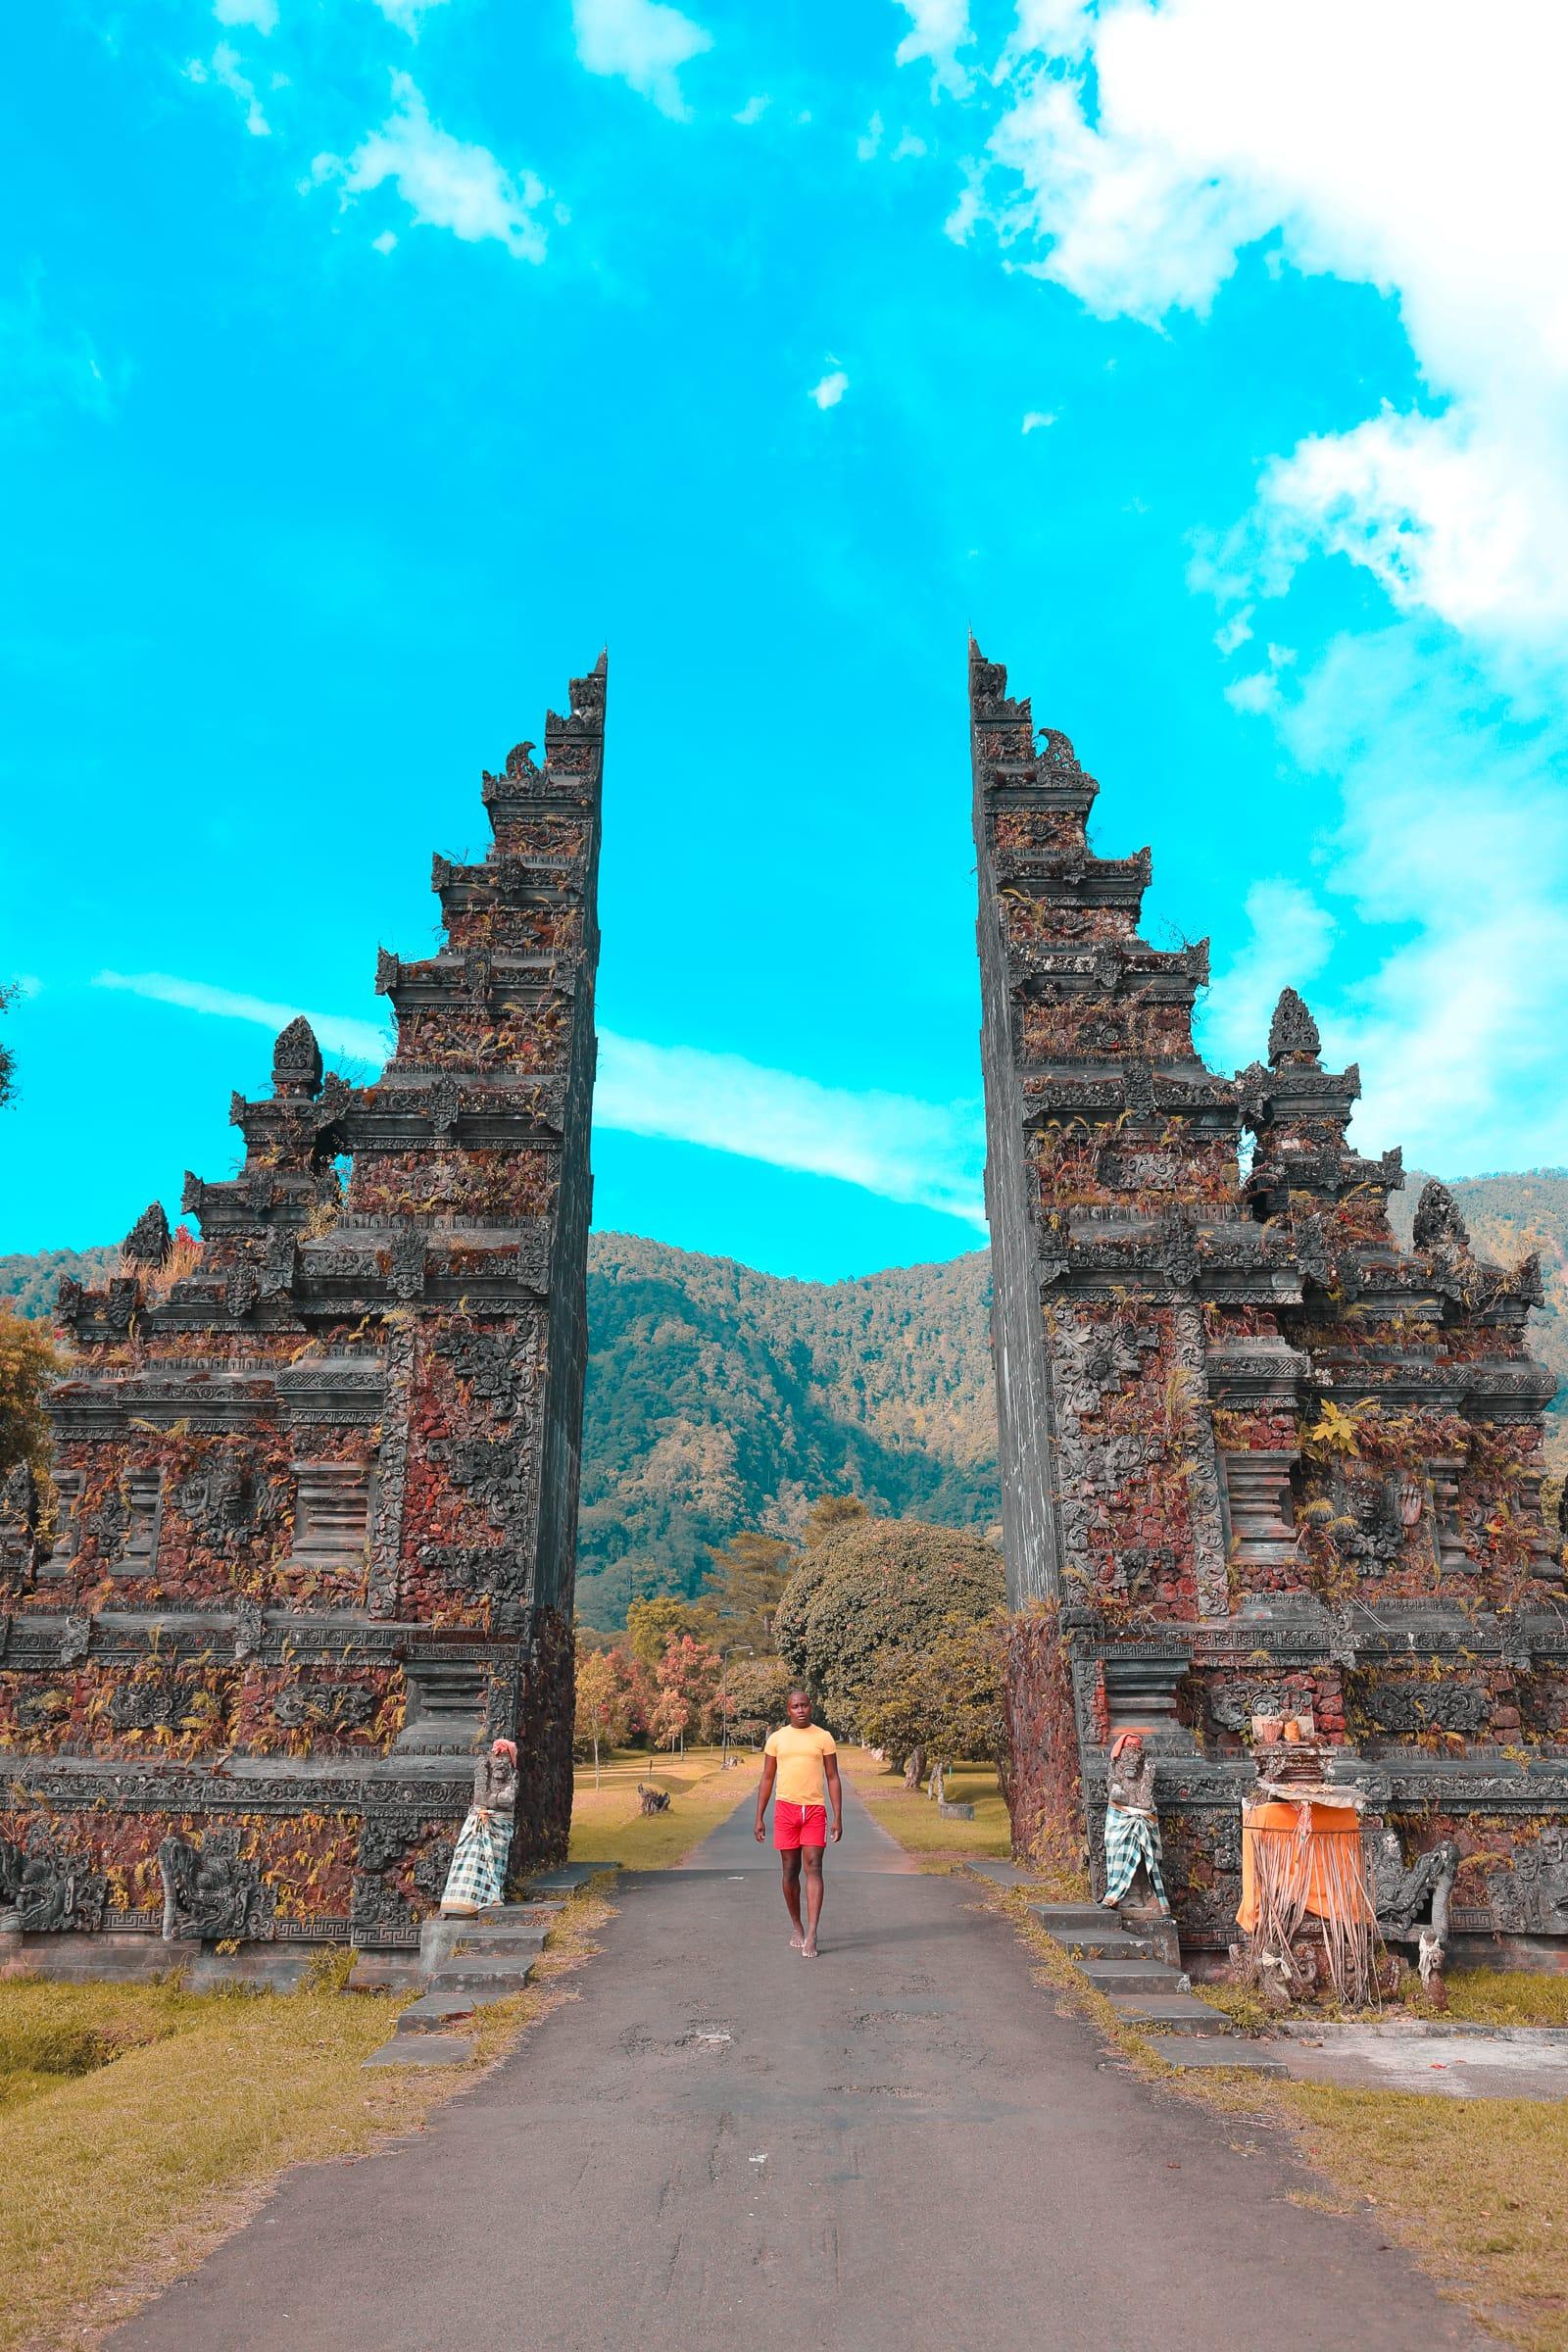 The Amazing Banyumala Twin Waterfalls In The Jungles Of Bali (5)